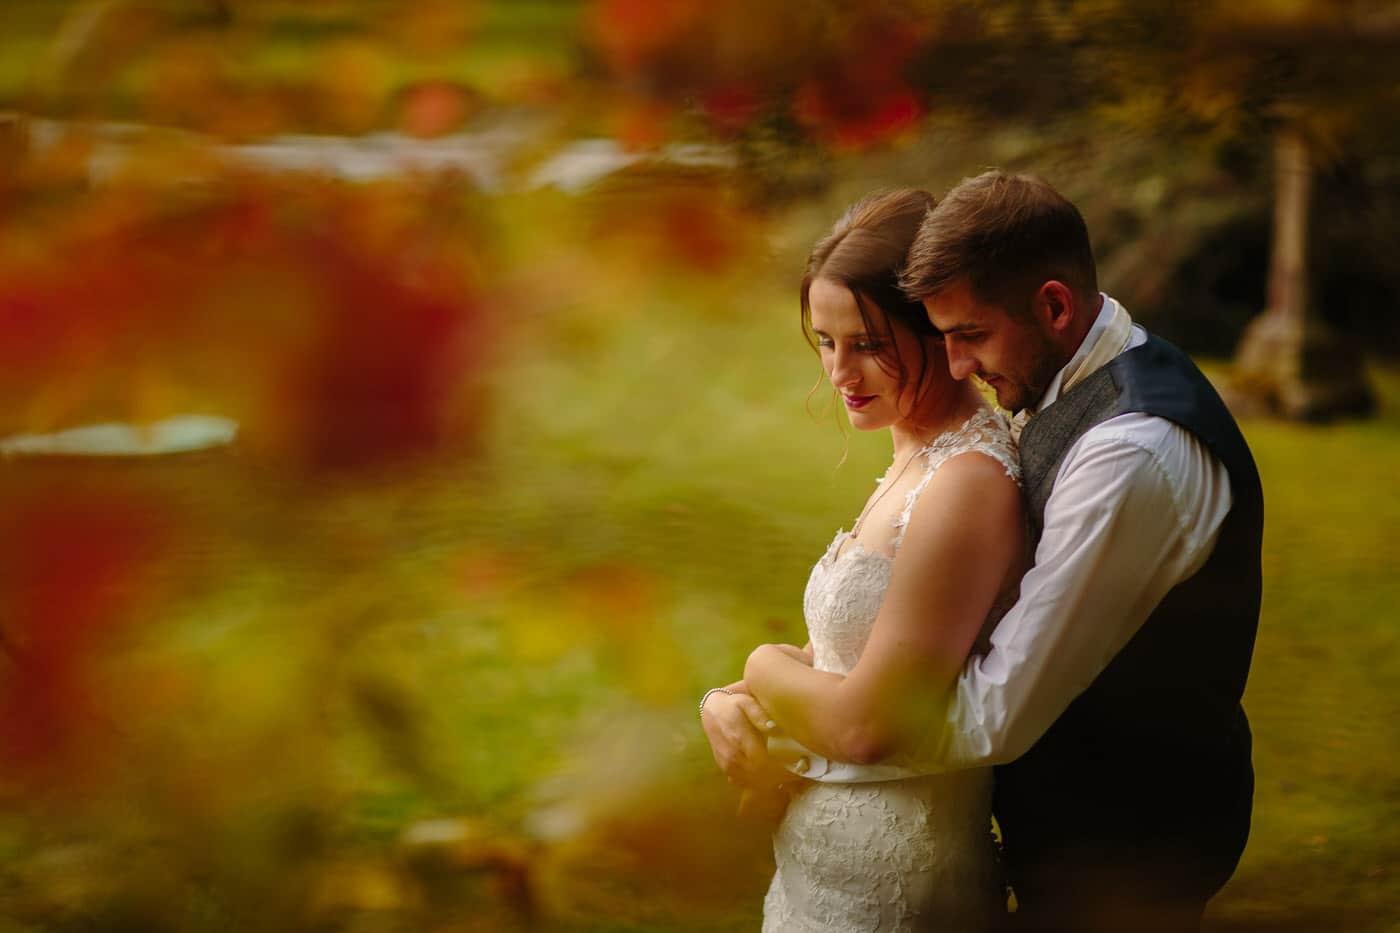 AA PENTREMAWRNORTH WALES WEDDING 2103